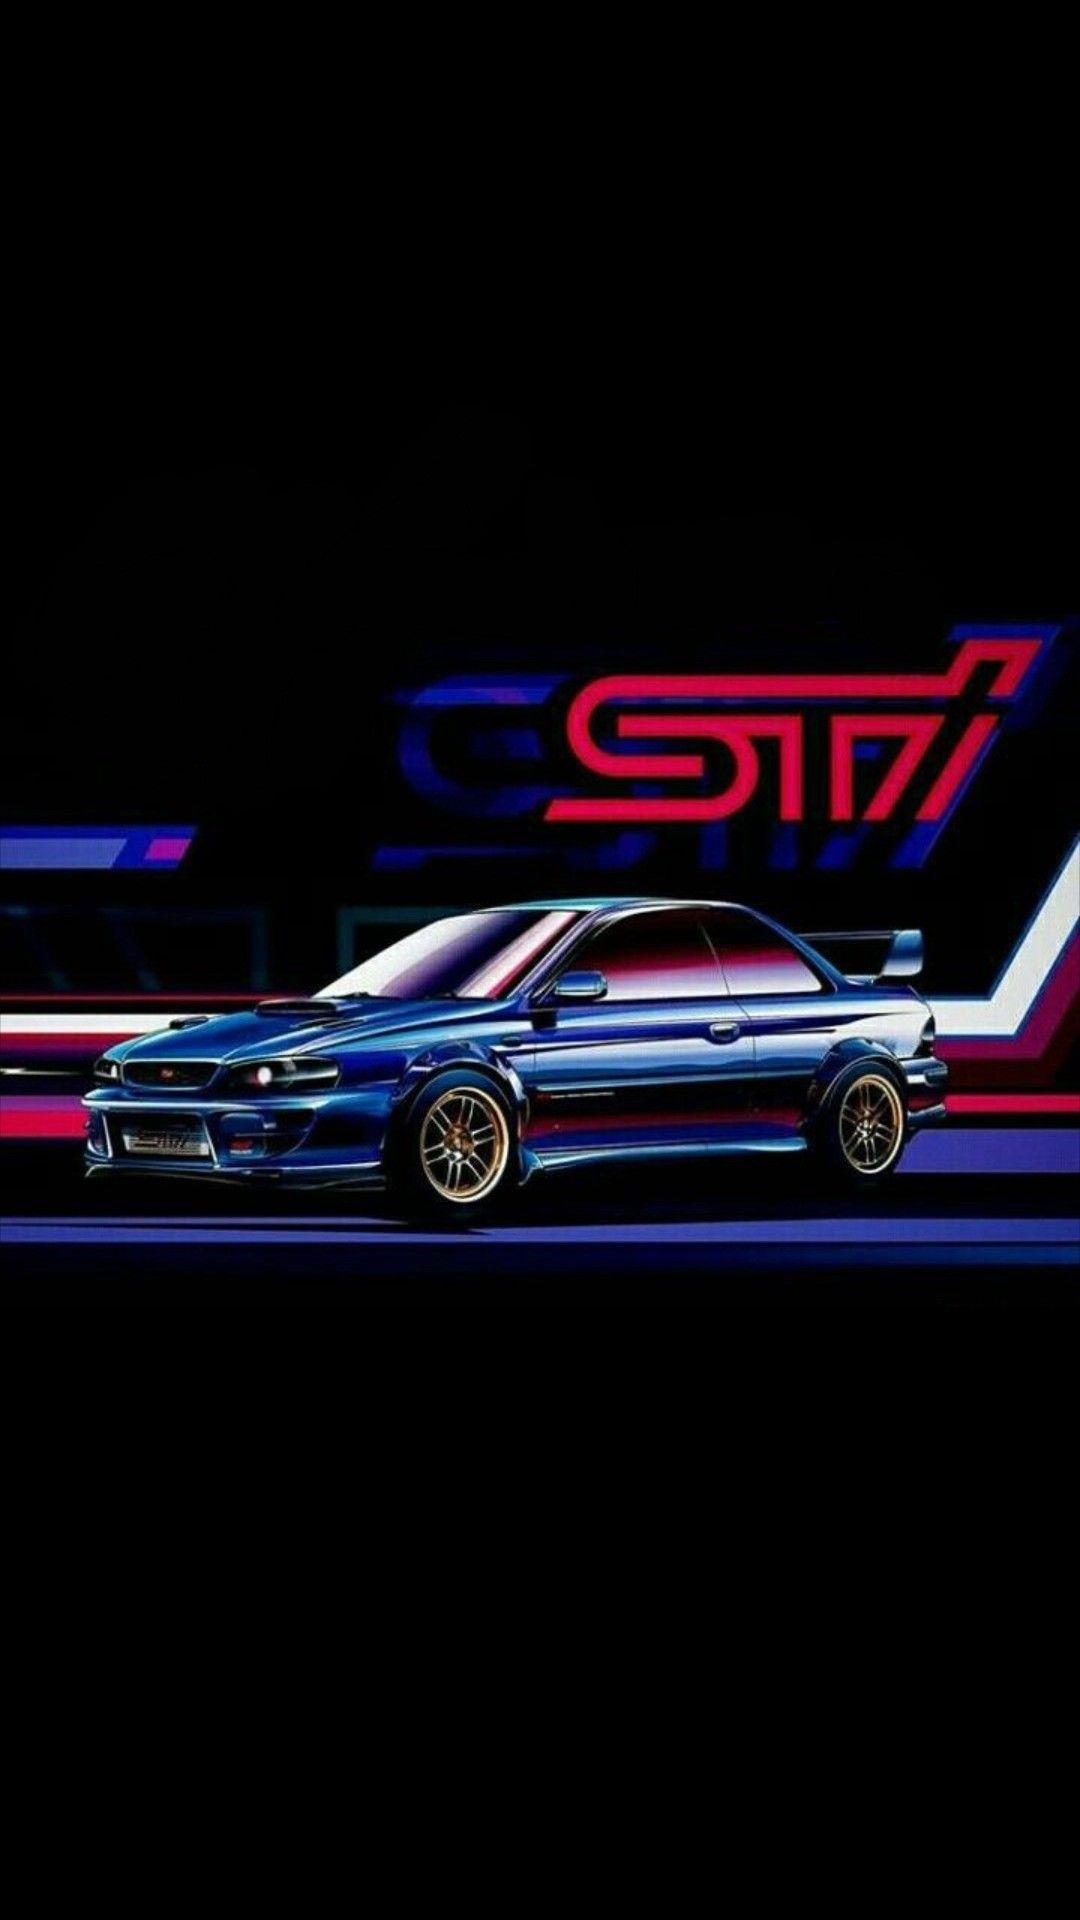 Pin by Aris Wibowo on Car vectors | Subaru impreza sti ...